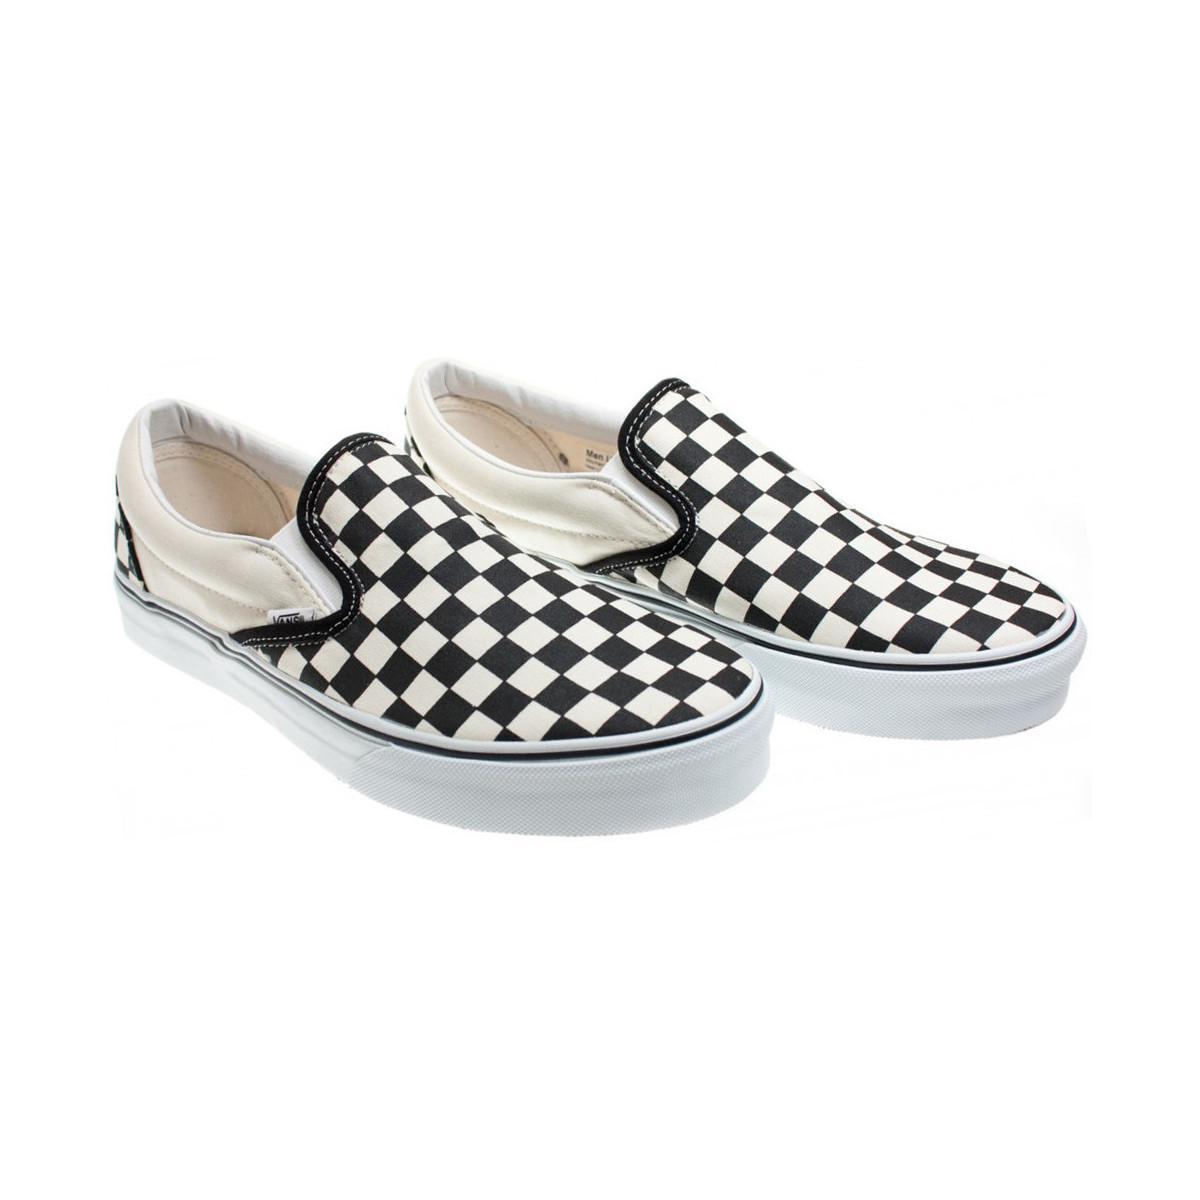 090984b5b5 Vans - Classic Black And Cream Checkerboard Slip-on Trainers - Womens Uk 7  -. View fullscreen